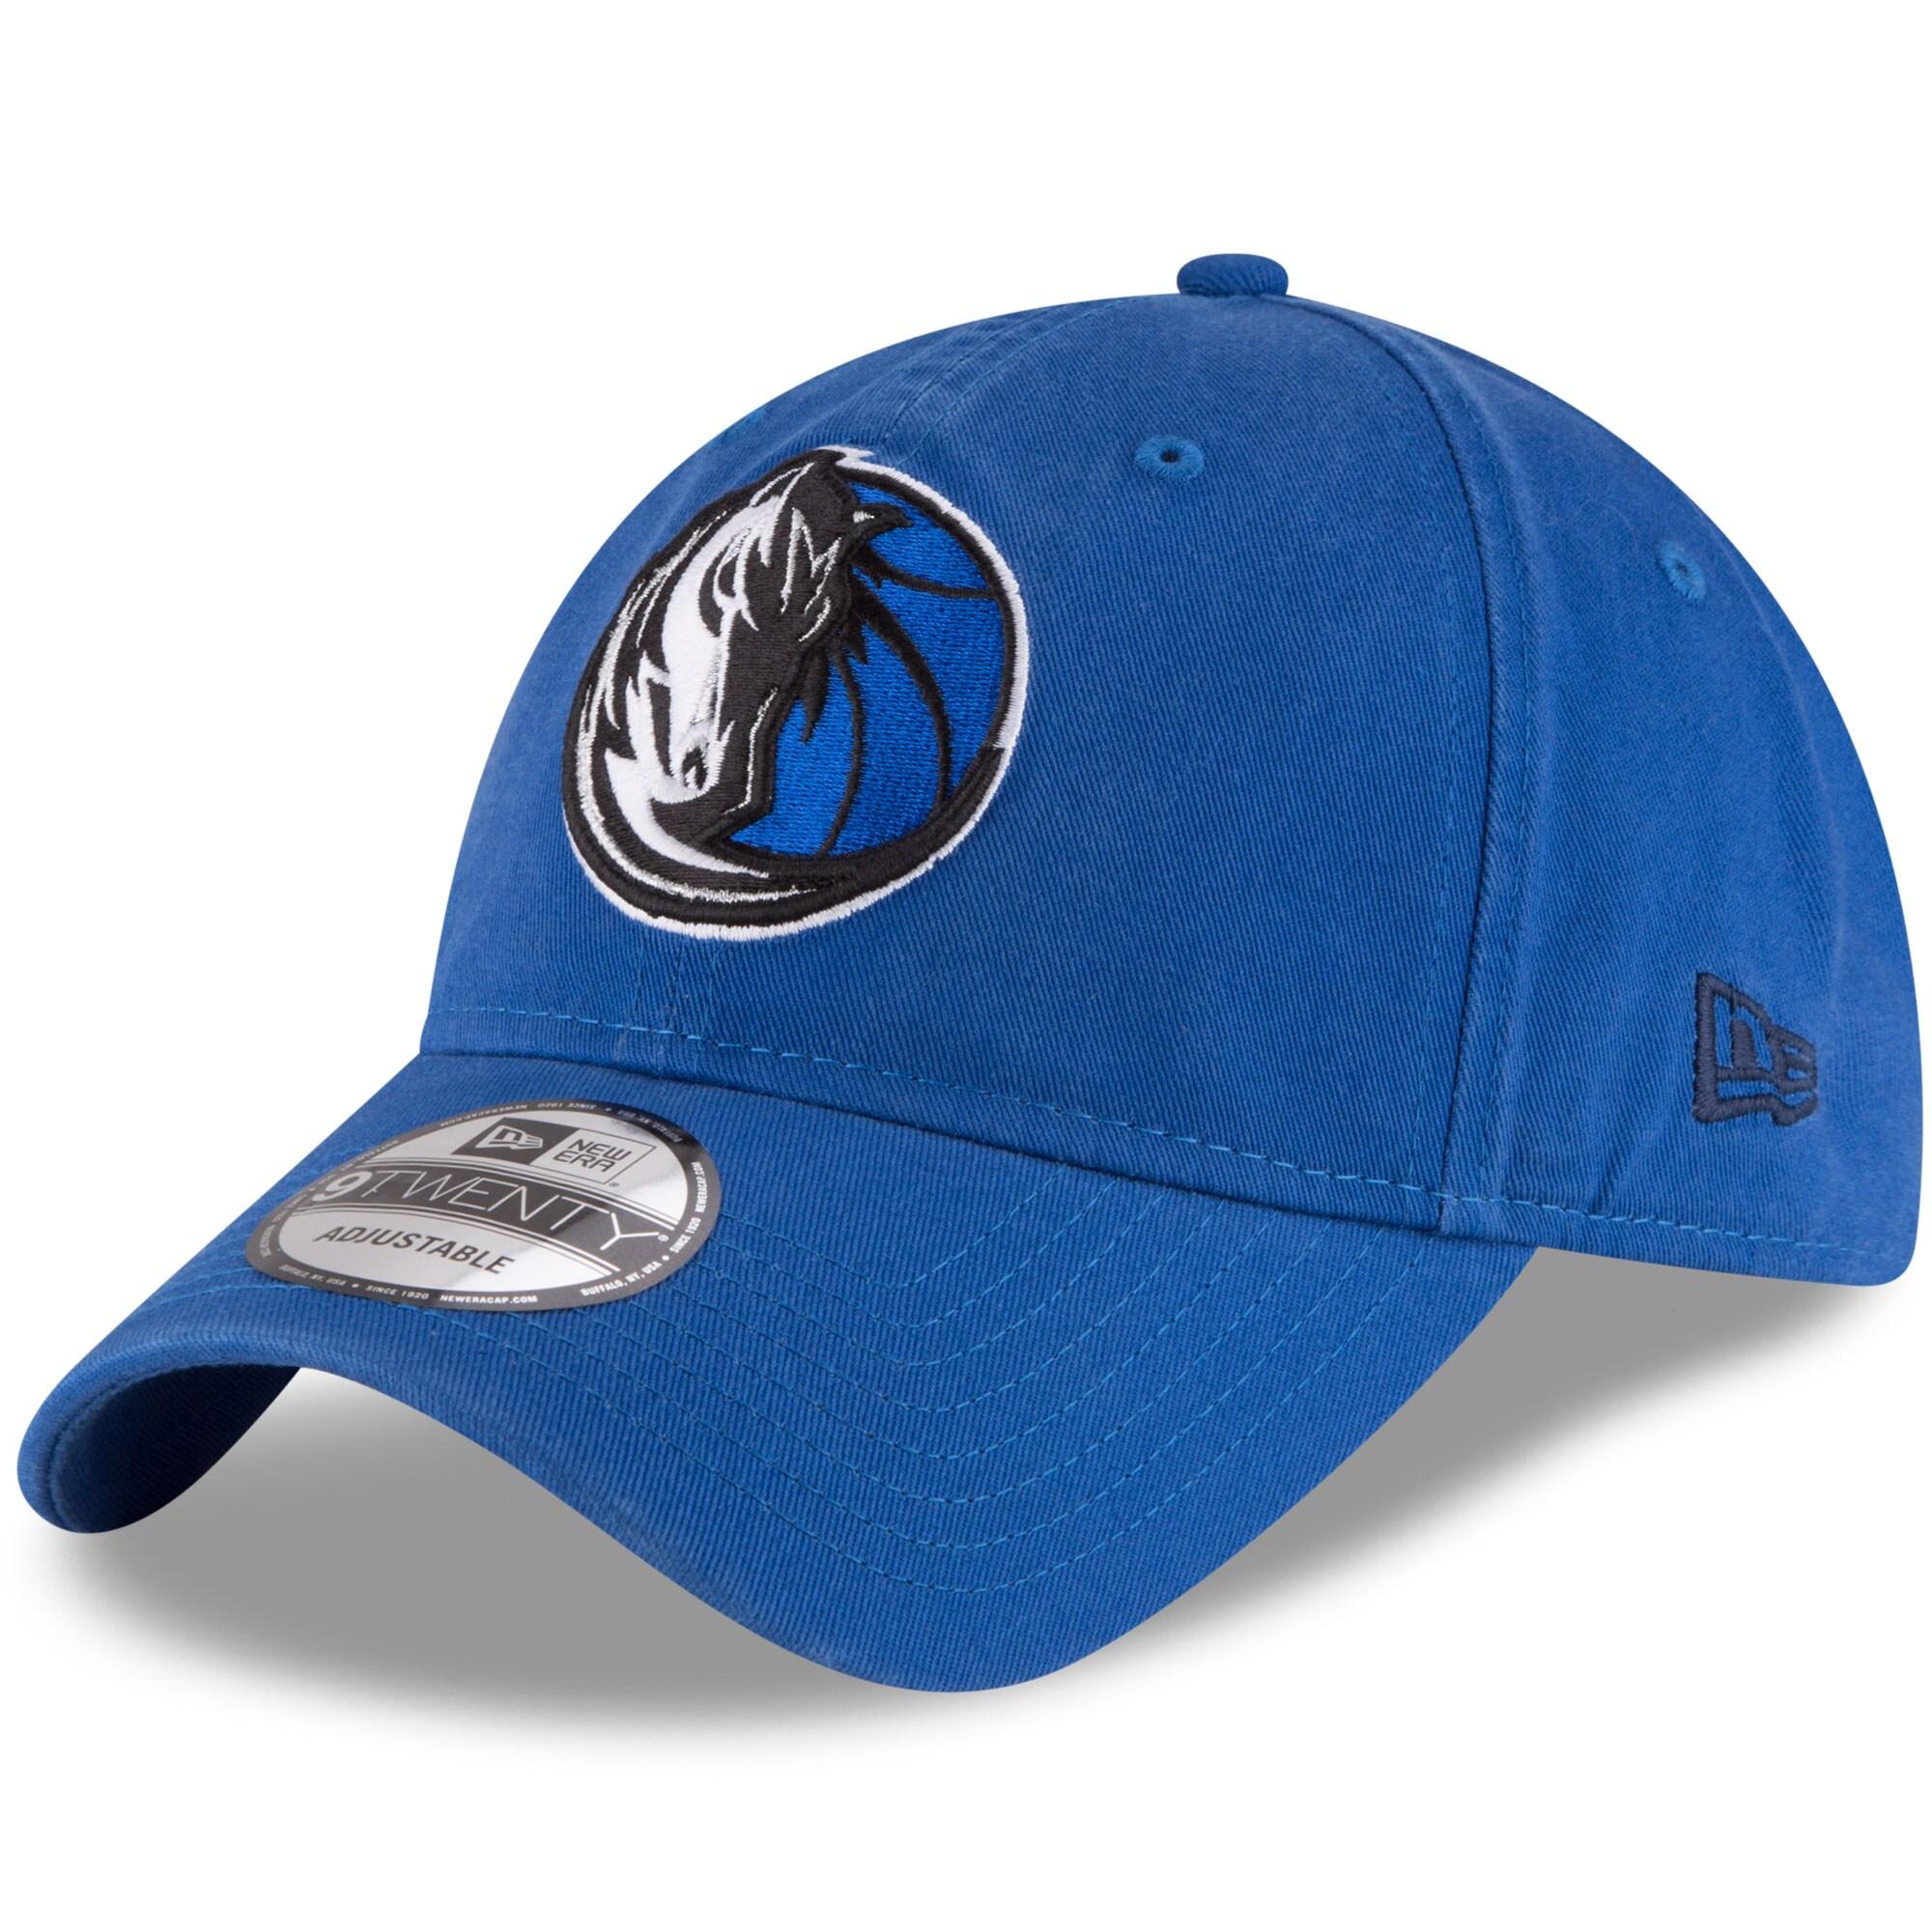 Dallas Mavericks New Era Official Team Color 9TWENTY Adjustable Hat - Blue